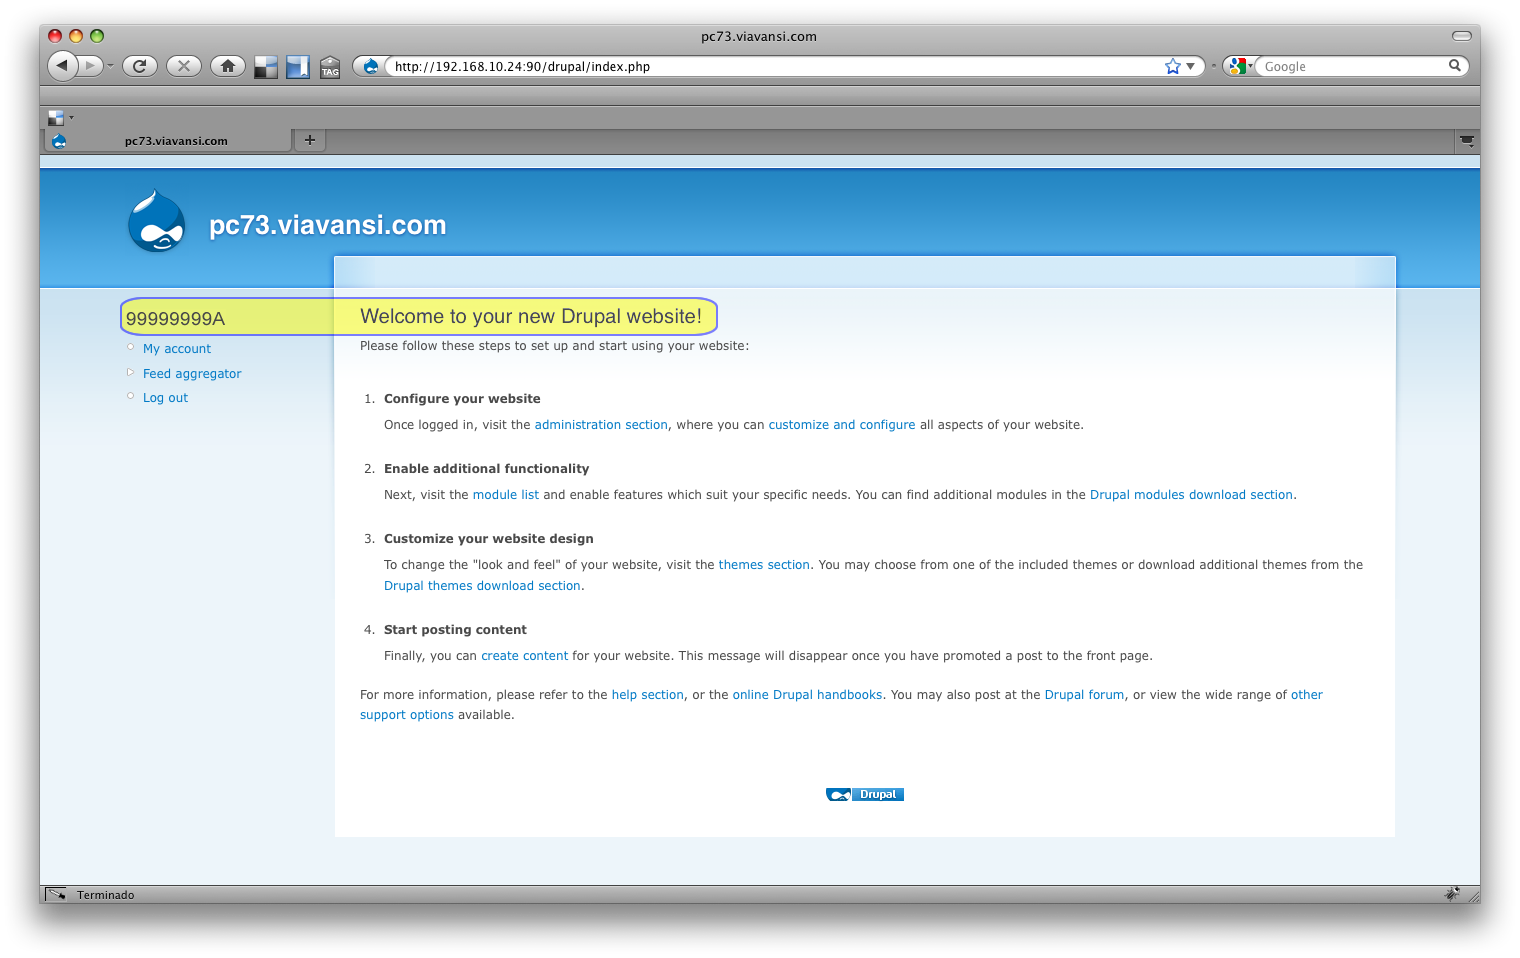 captura mensaje de bienvenida a Drupal